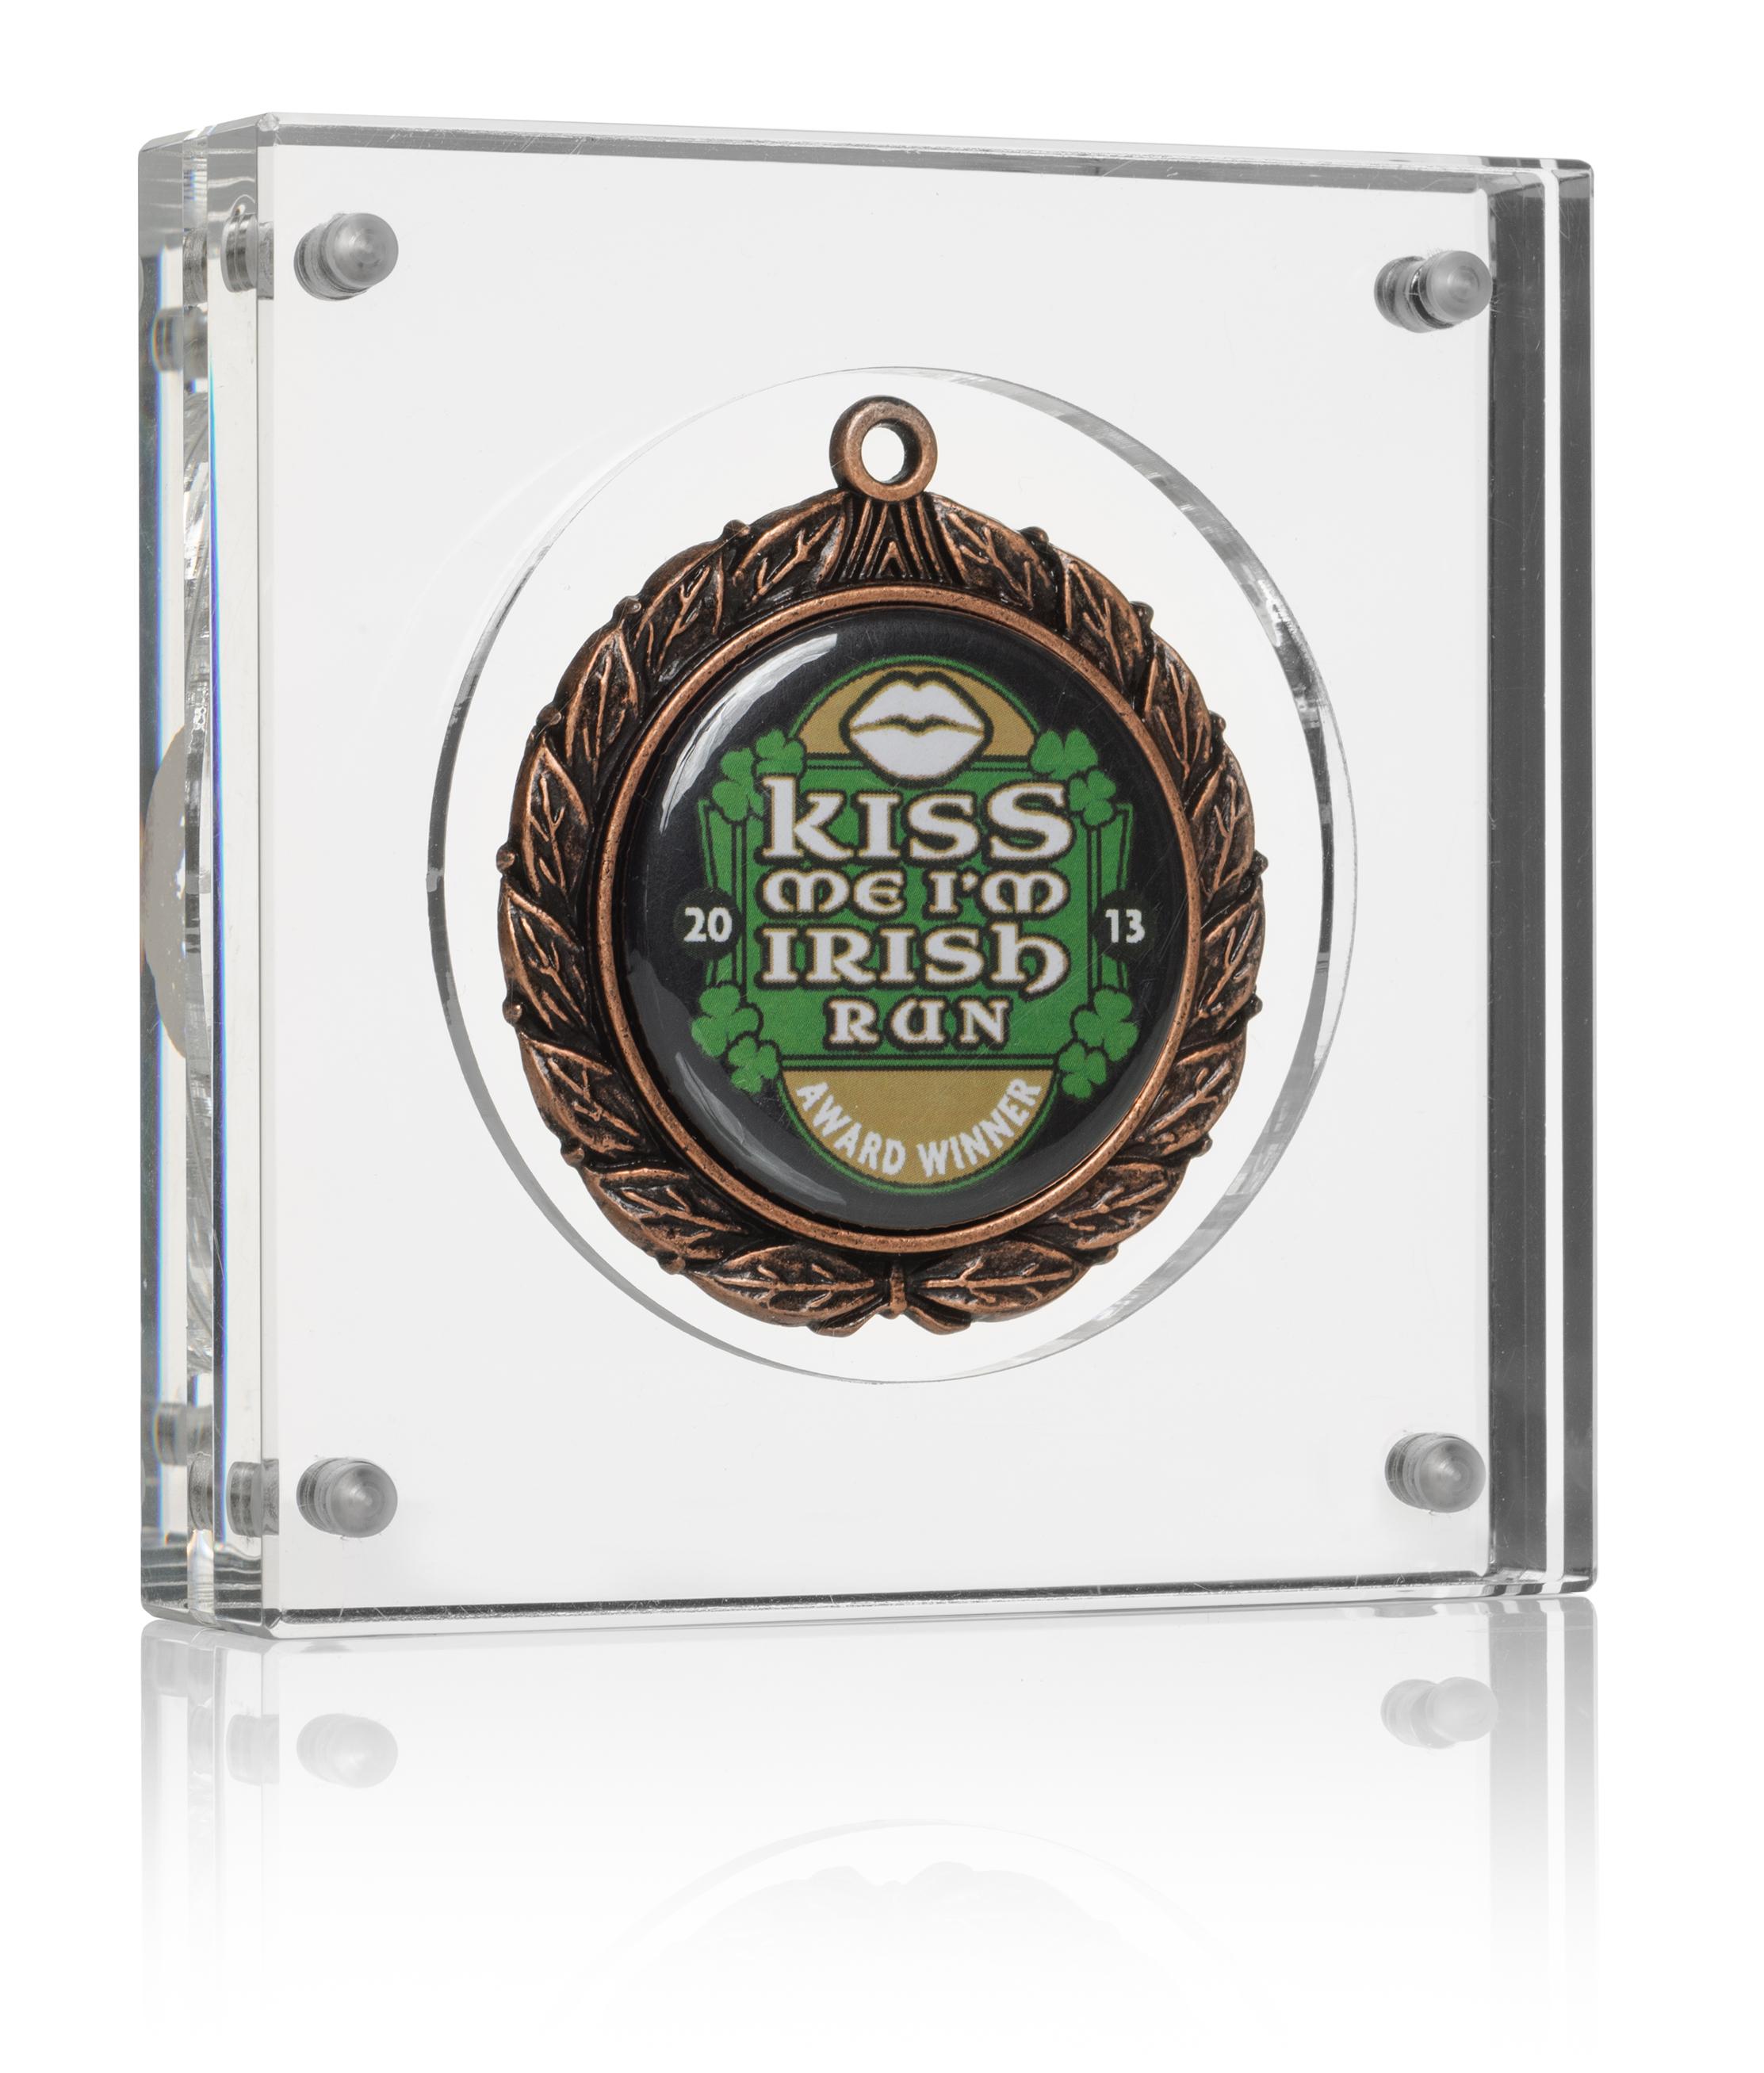 Medal Frames - Stories about Running Medals - Marathon, Baseball ...